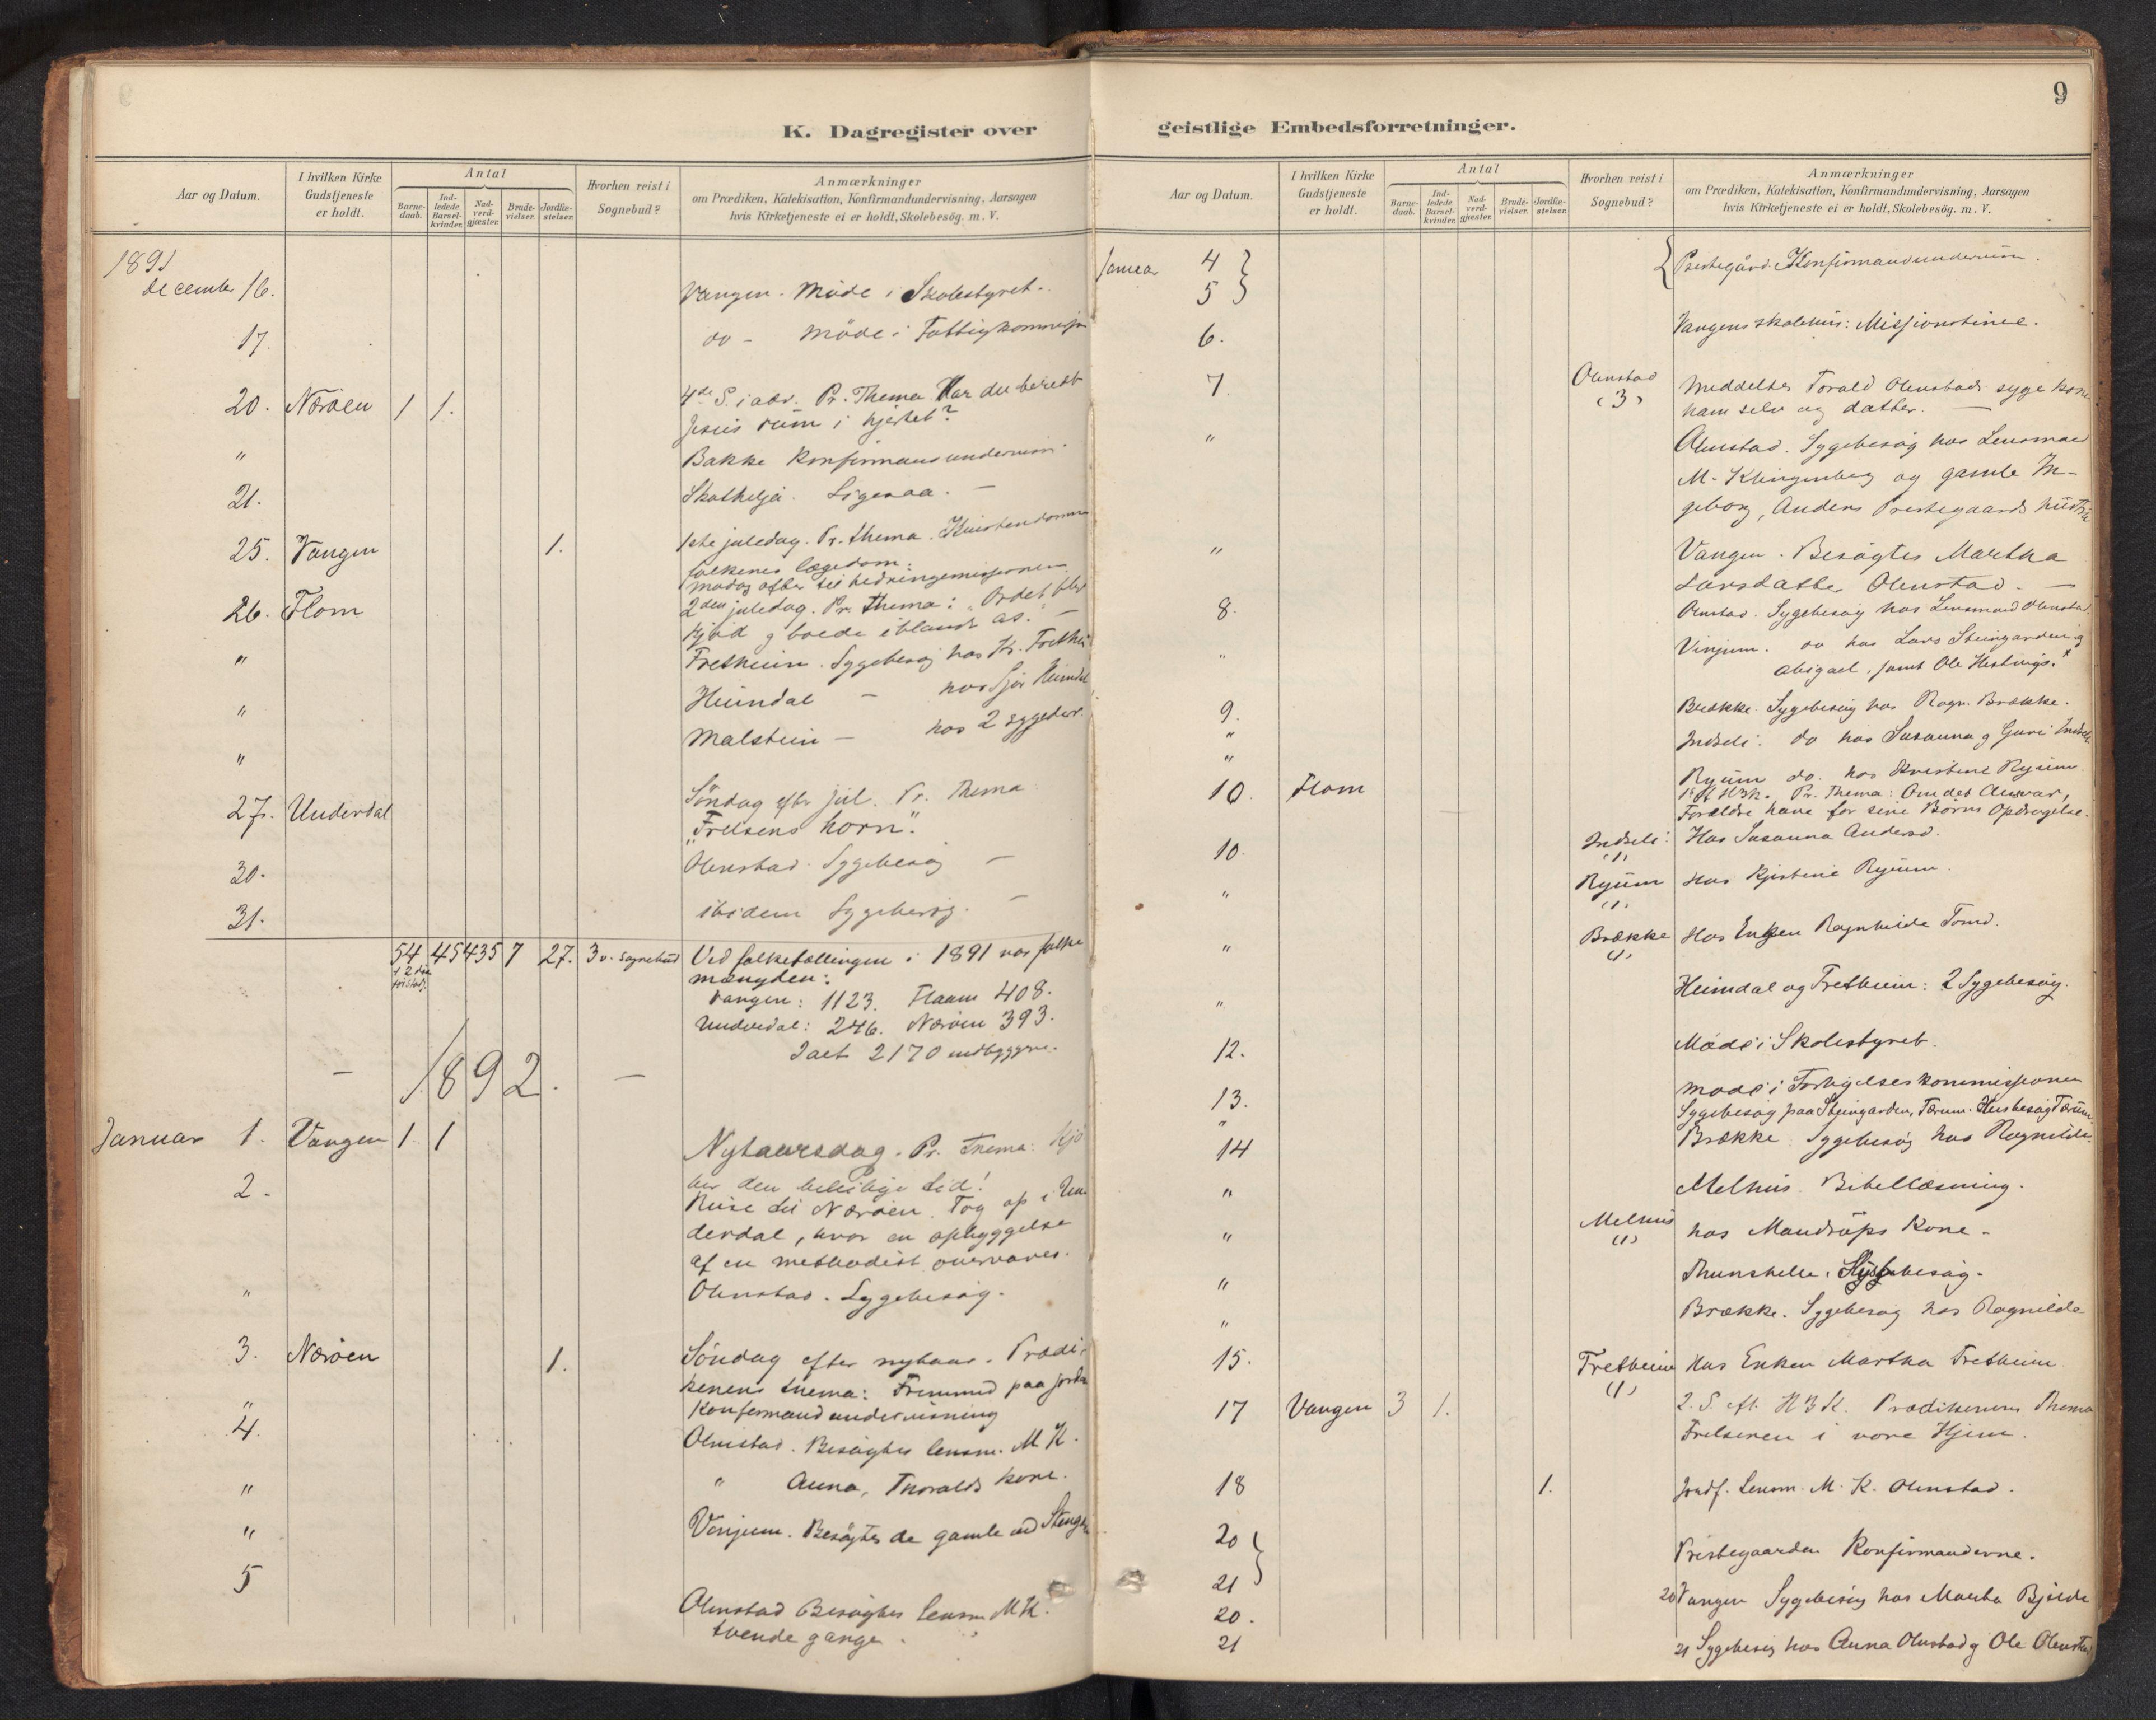 SAB, Aurland Sokneprestembete*, Dagregister nr. F 2, 1891-1932, s. 8b-9a